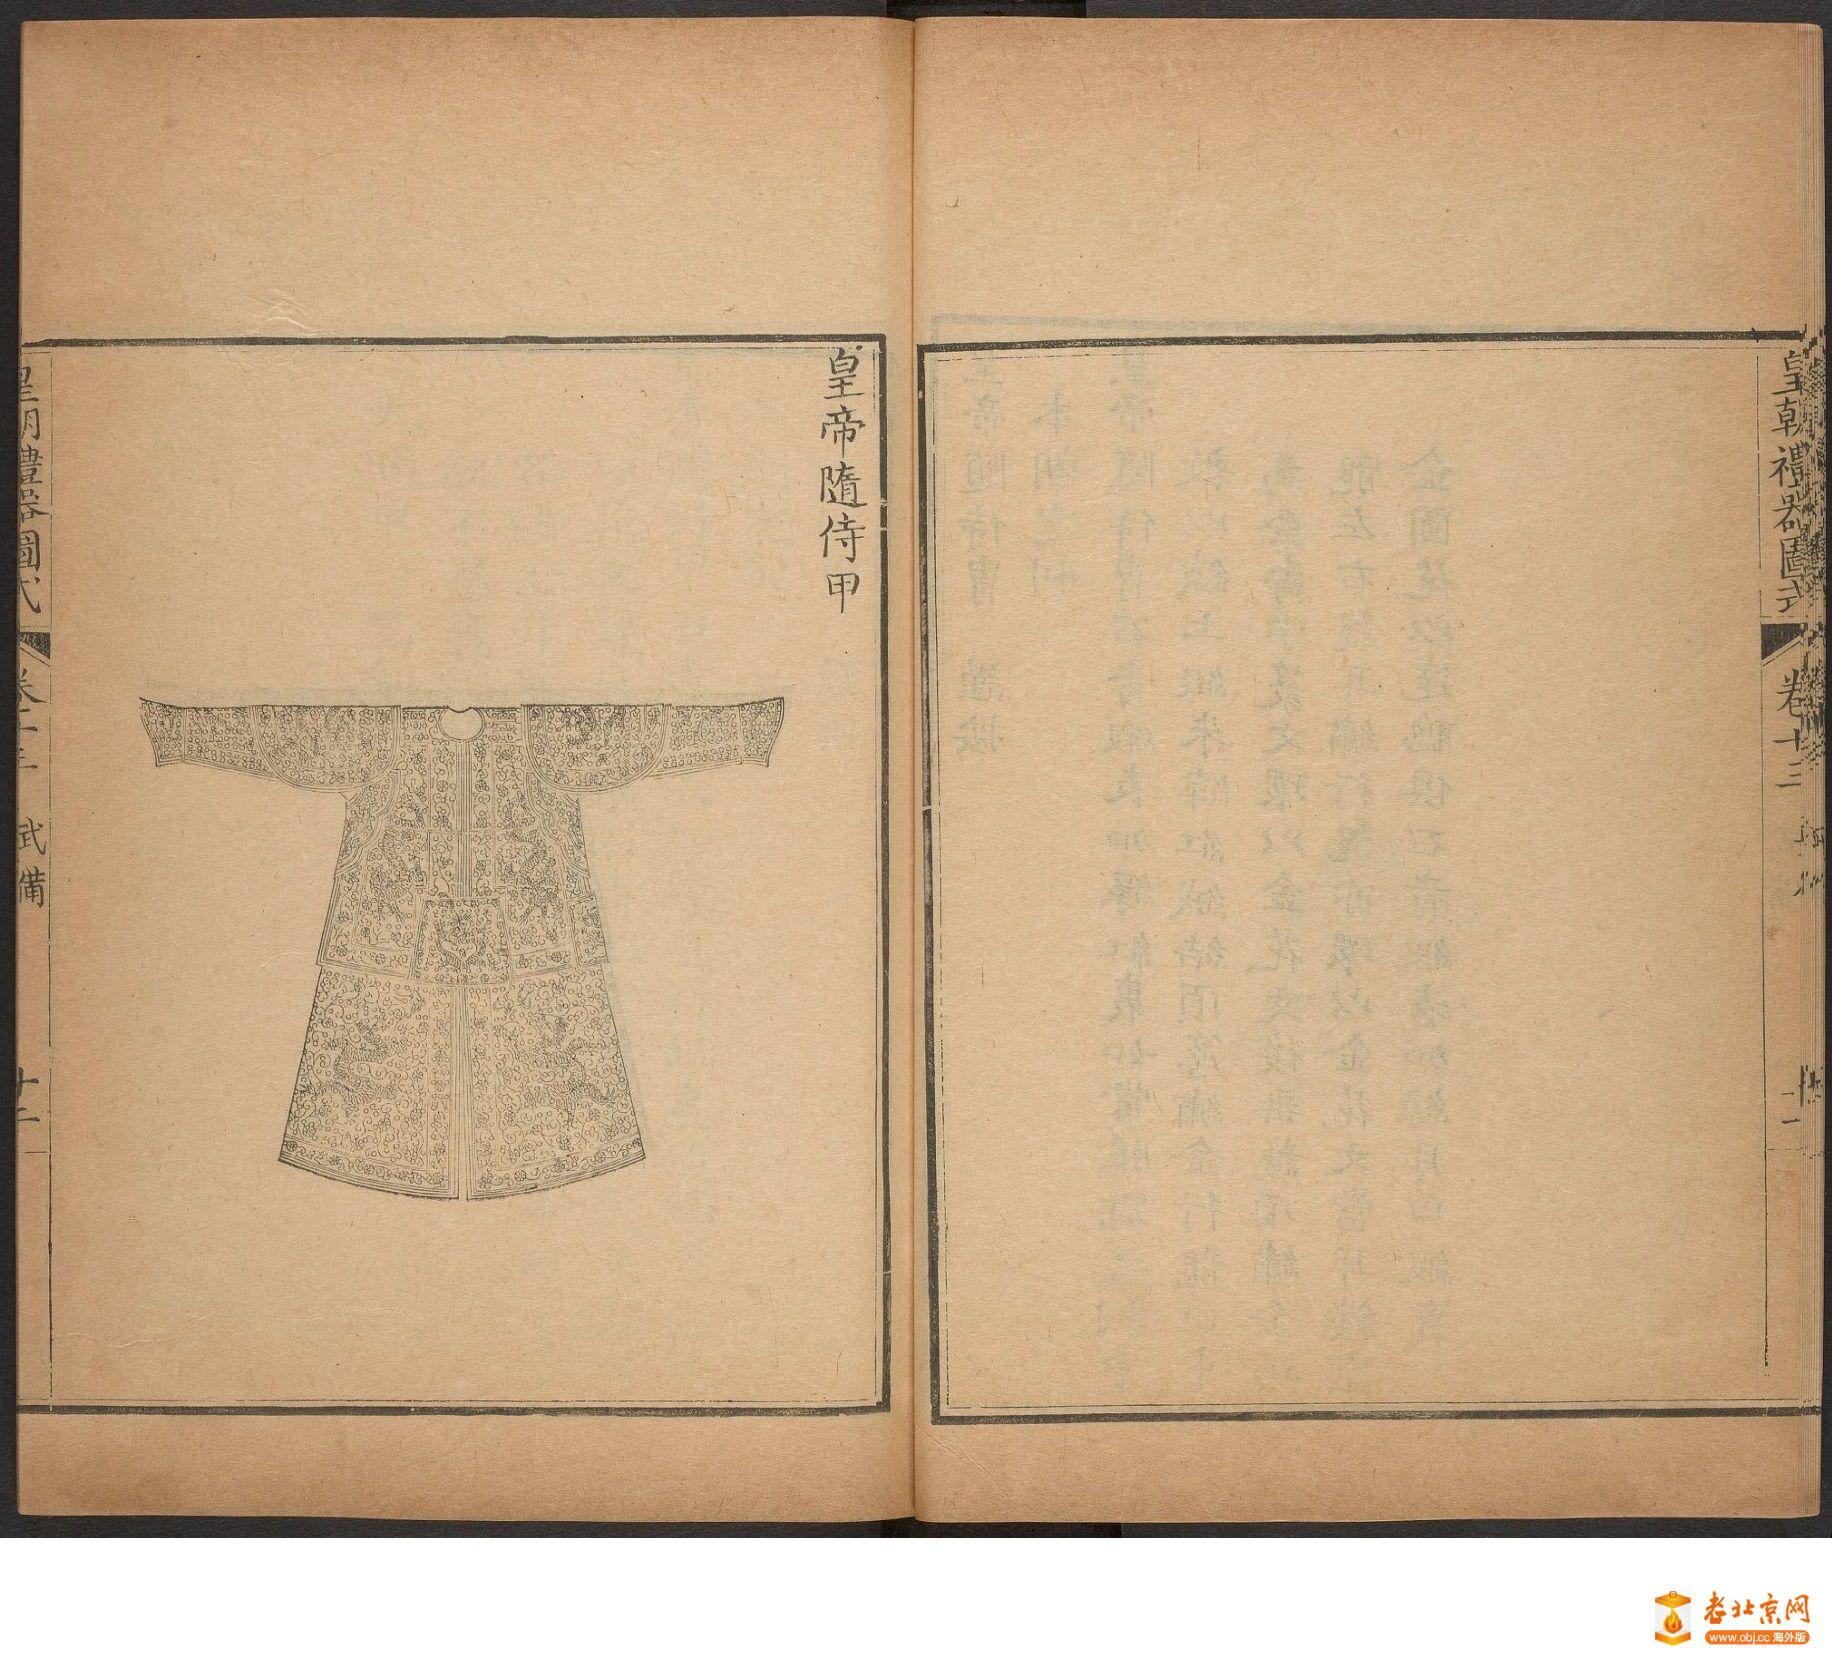 2_page2_image1 - 複製.jpg